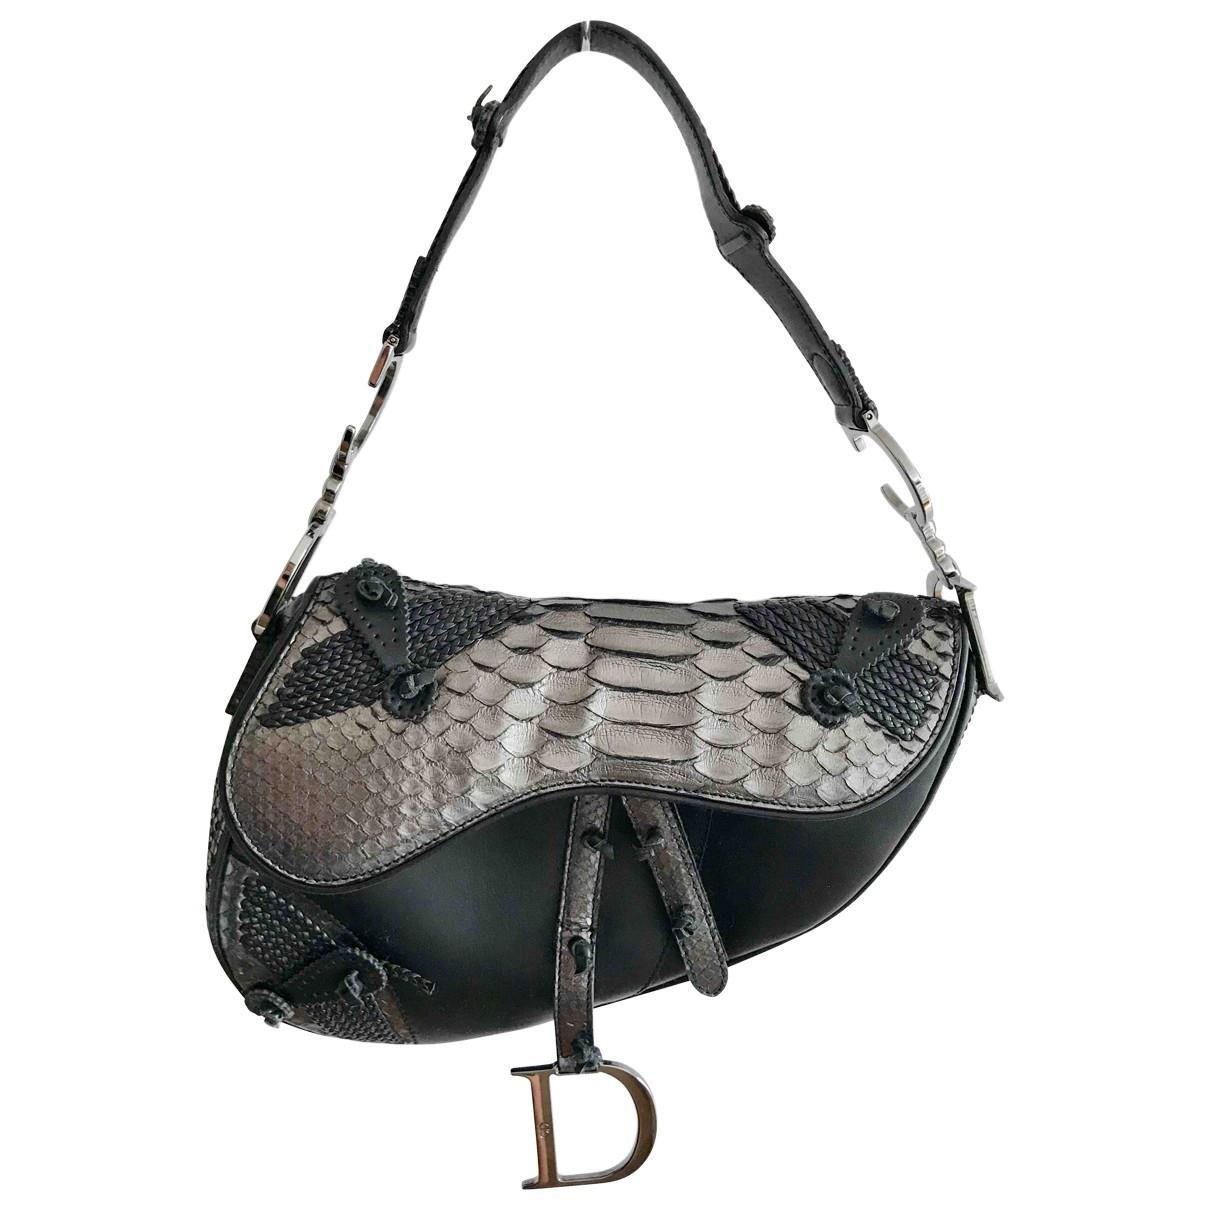 bf9afc3067a0 Lyst - Dior Pre-owned Saddle Python Handbag in Black